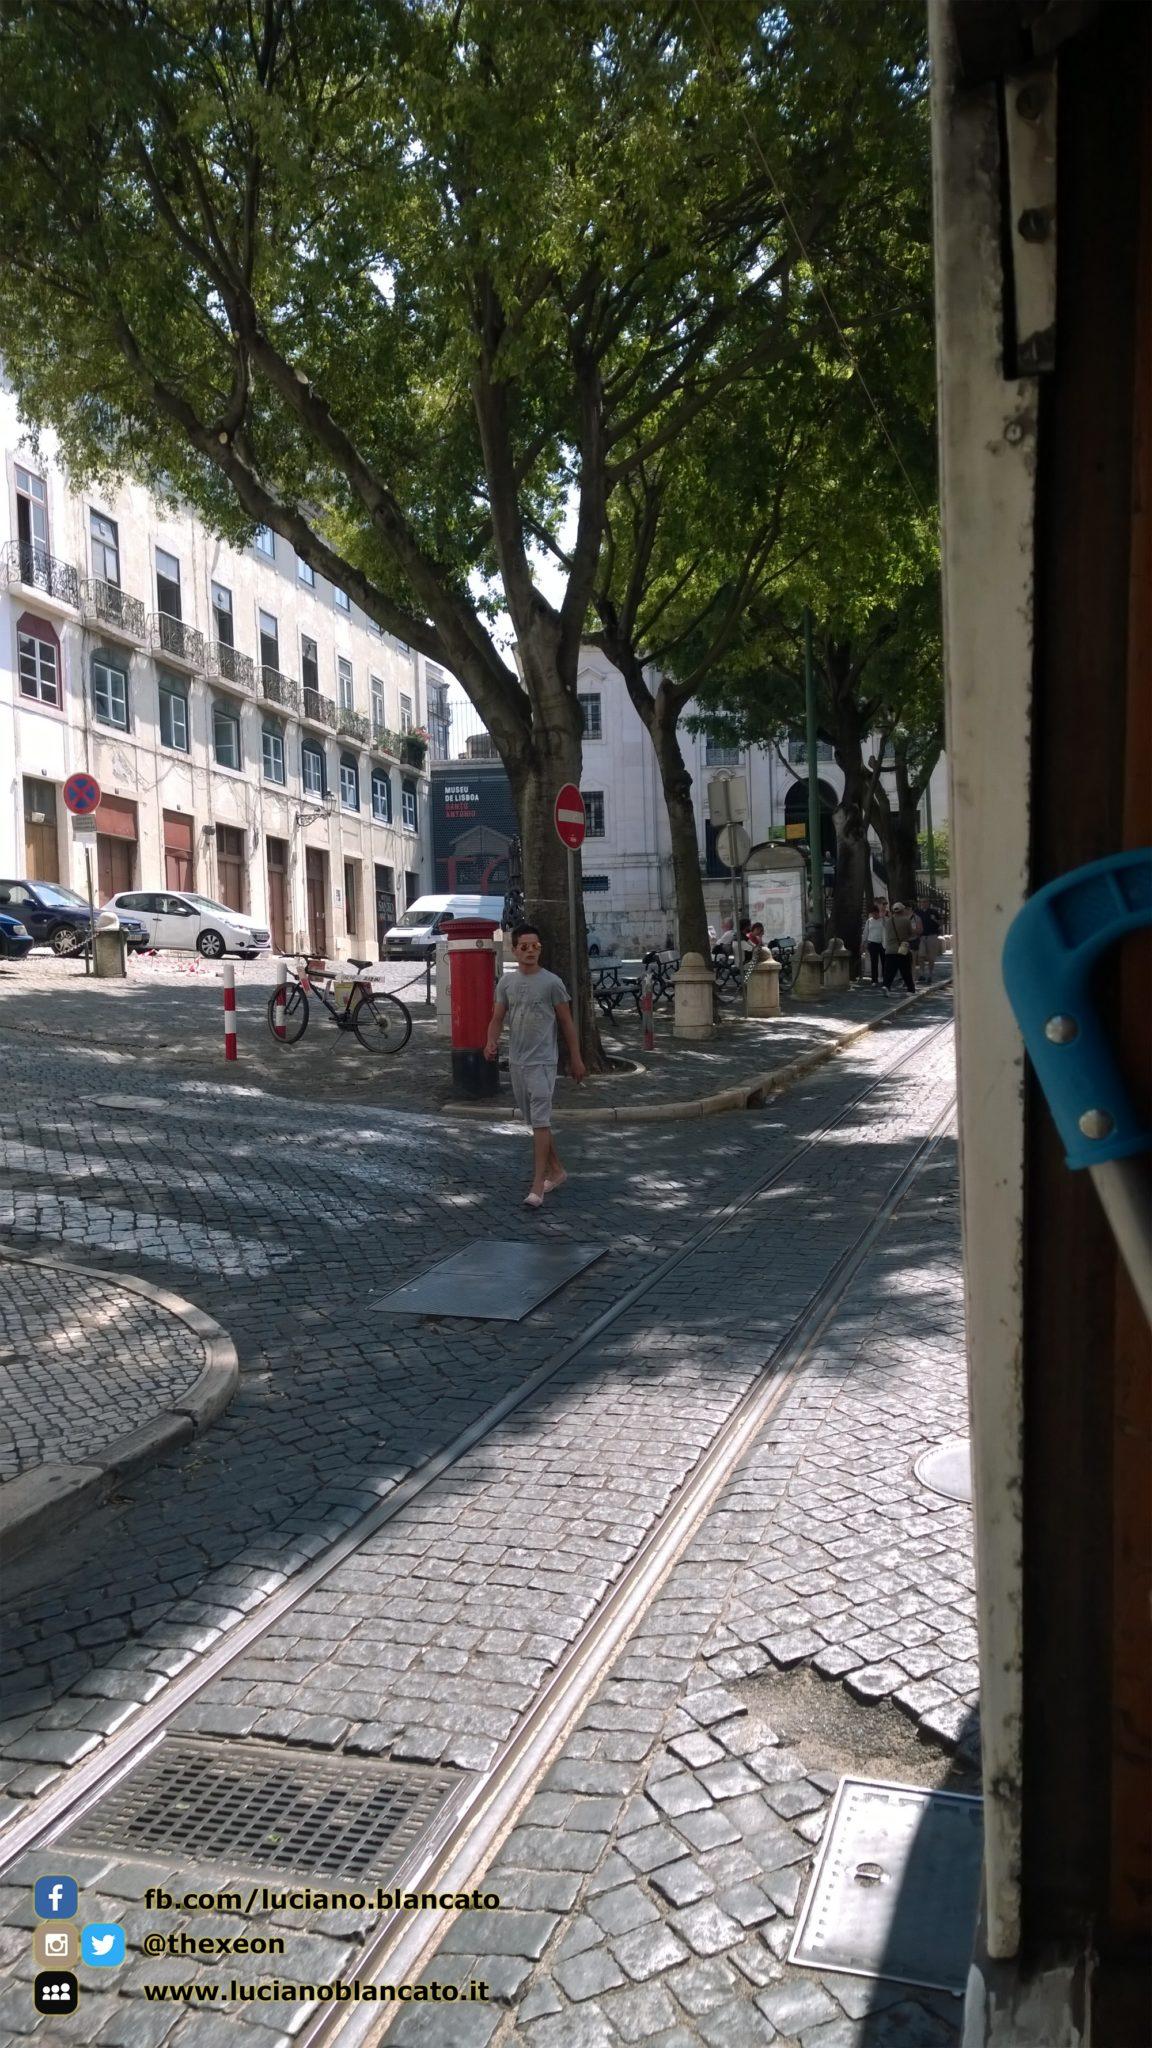 Lisbona - Piazza davanti al Museu Antonio Museu de Lisboa - Santo António